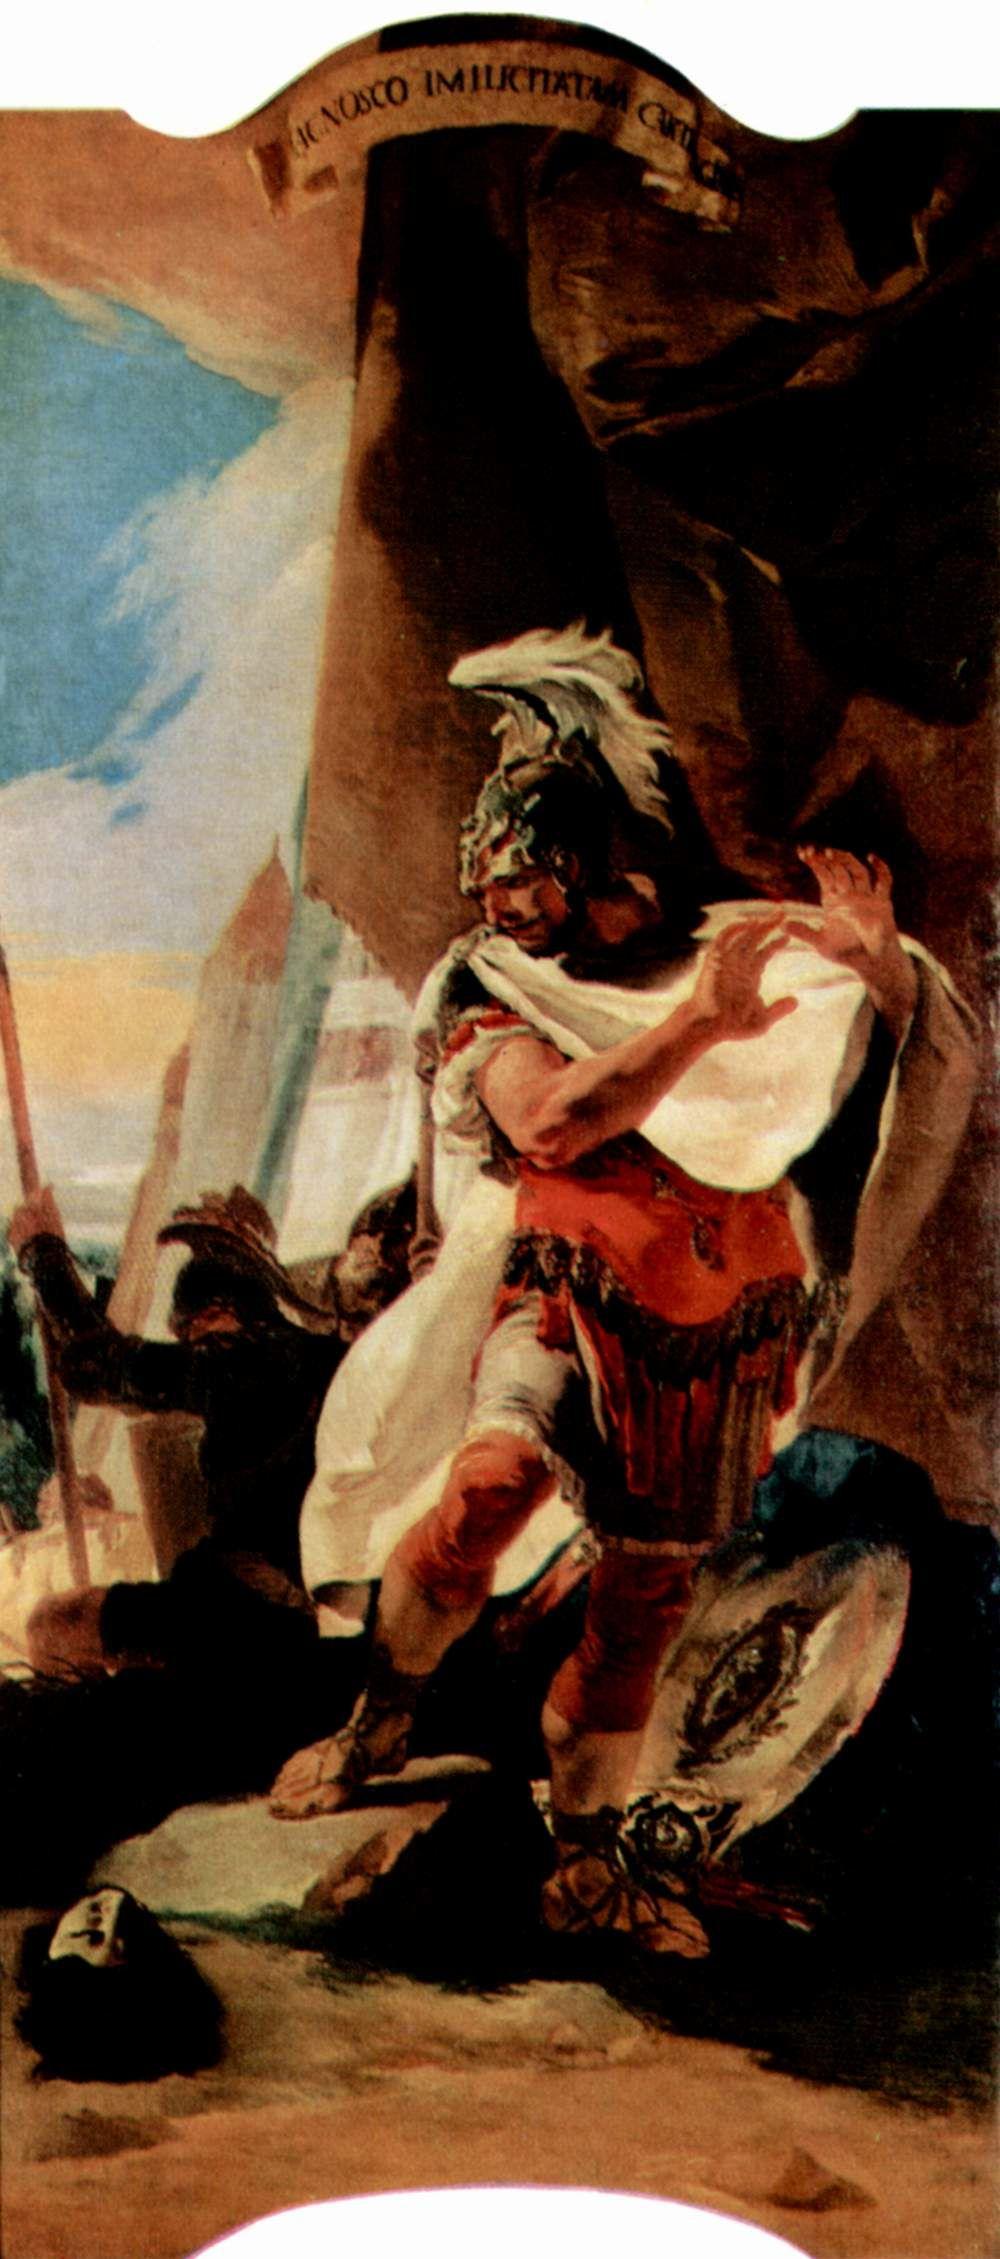 Quote Des Artistes Peintres giovanni battista tiepolo | rome antique, artiste, peintre